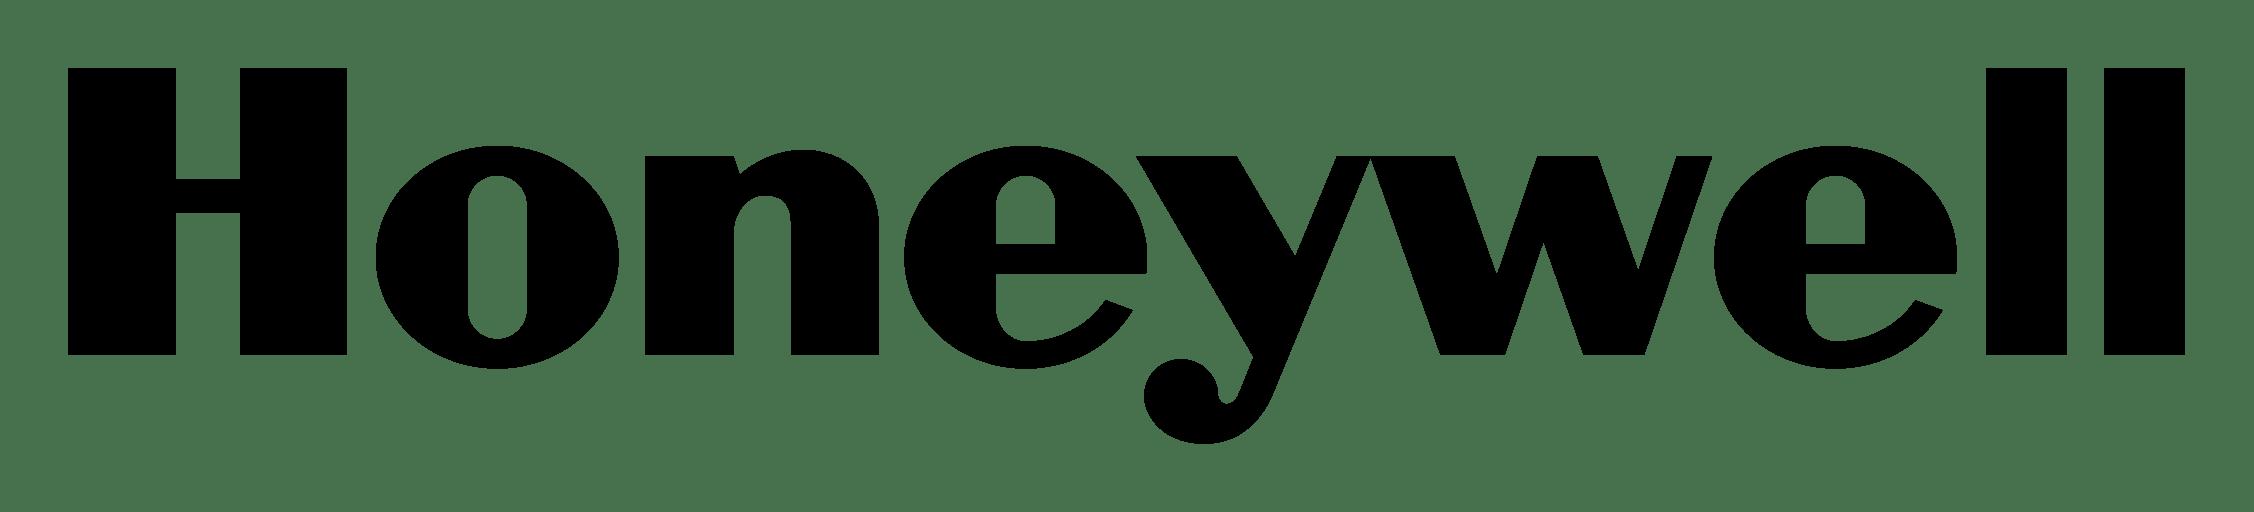 Honeywell Logo transparent PNG - StickPNG